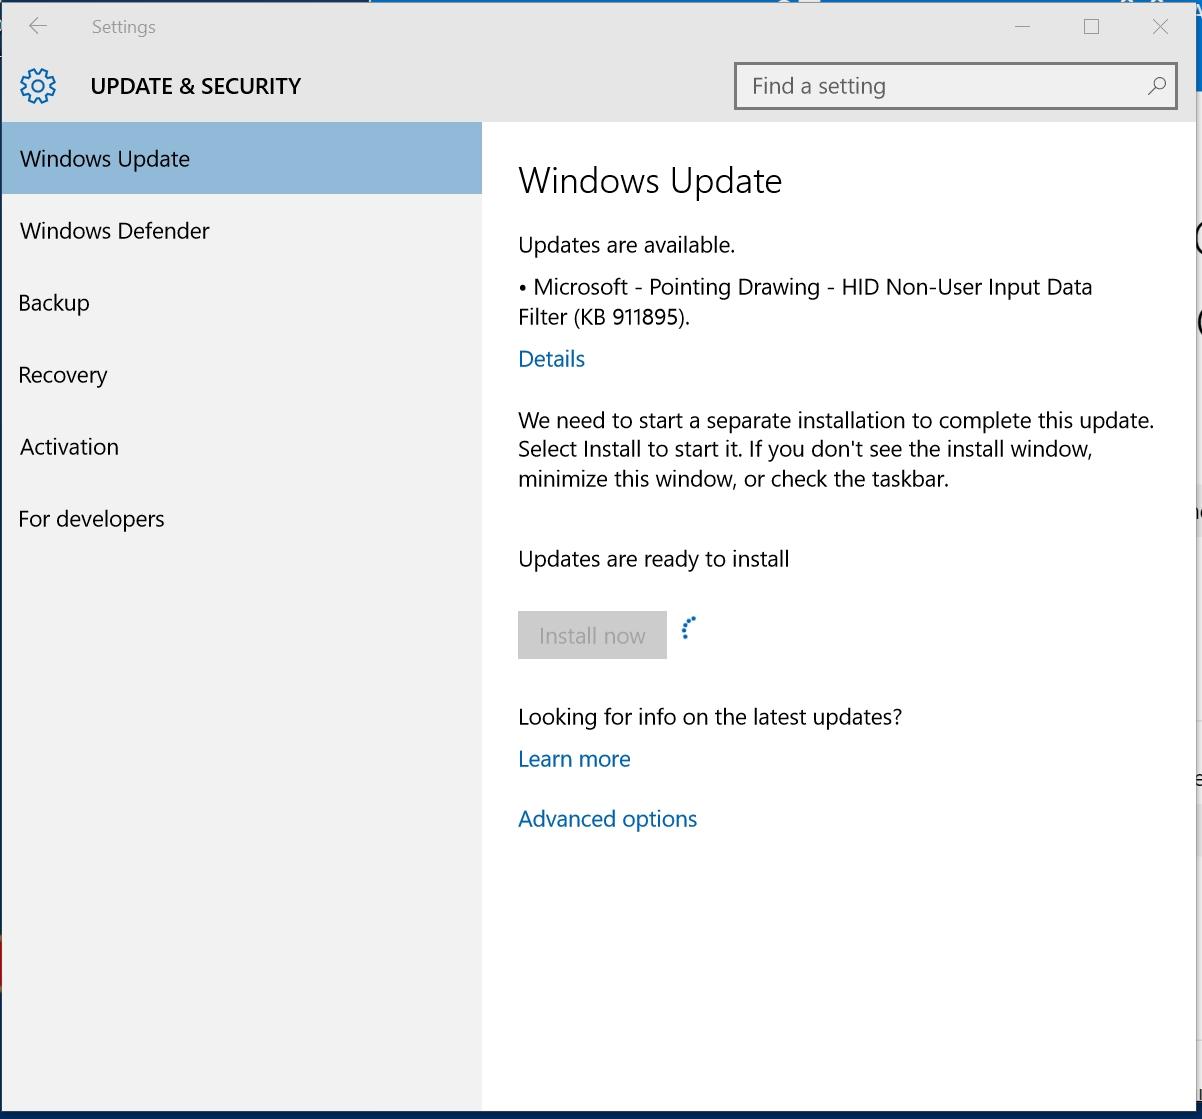 Windows 10 KB 911895